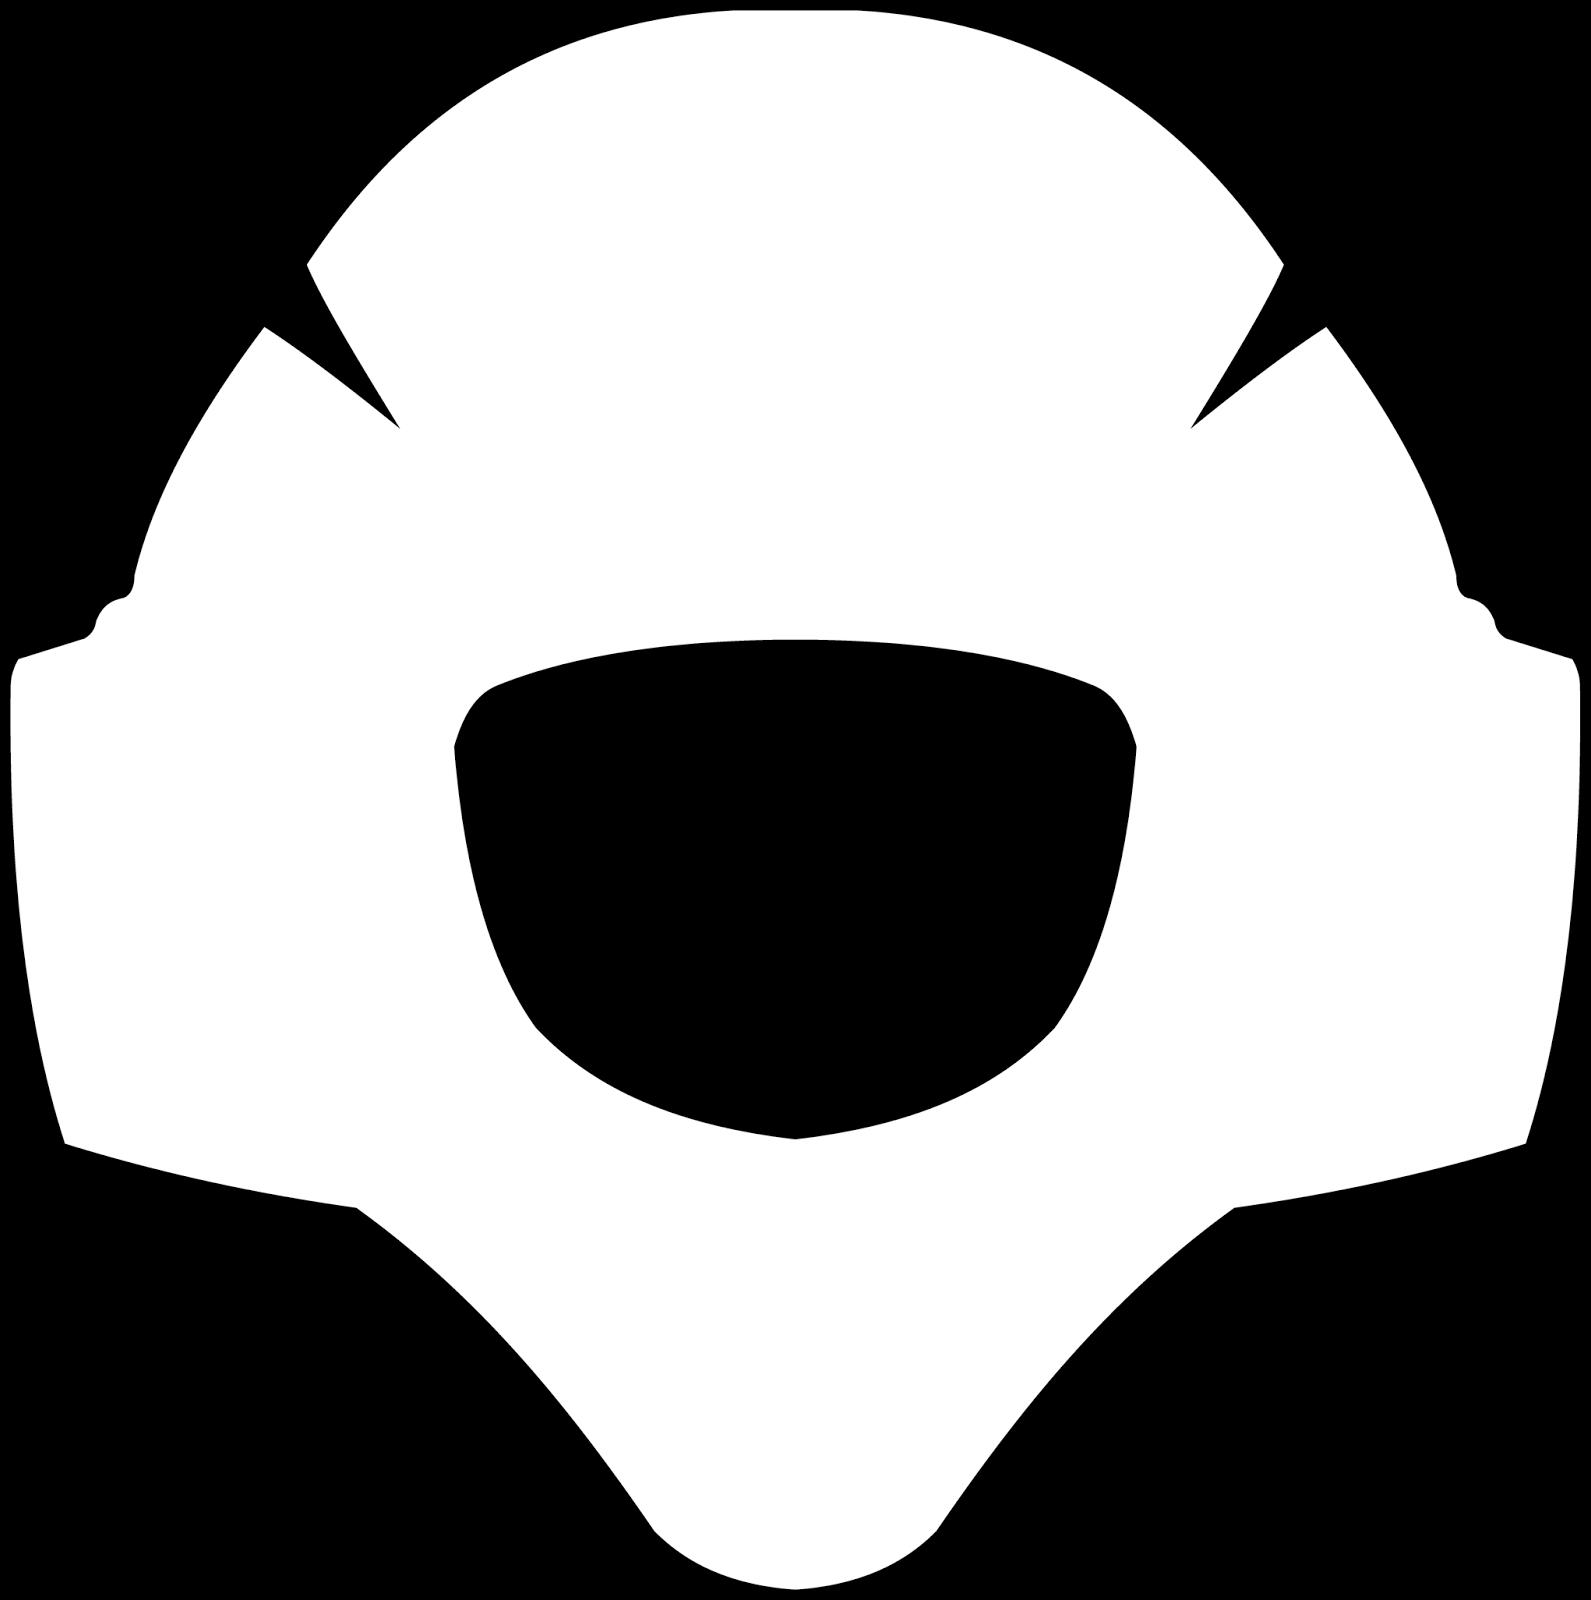 blank goalie mask template blank goalie mask template virtren com